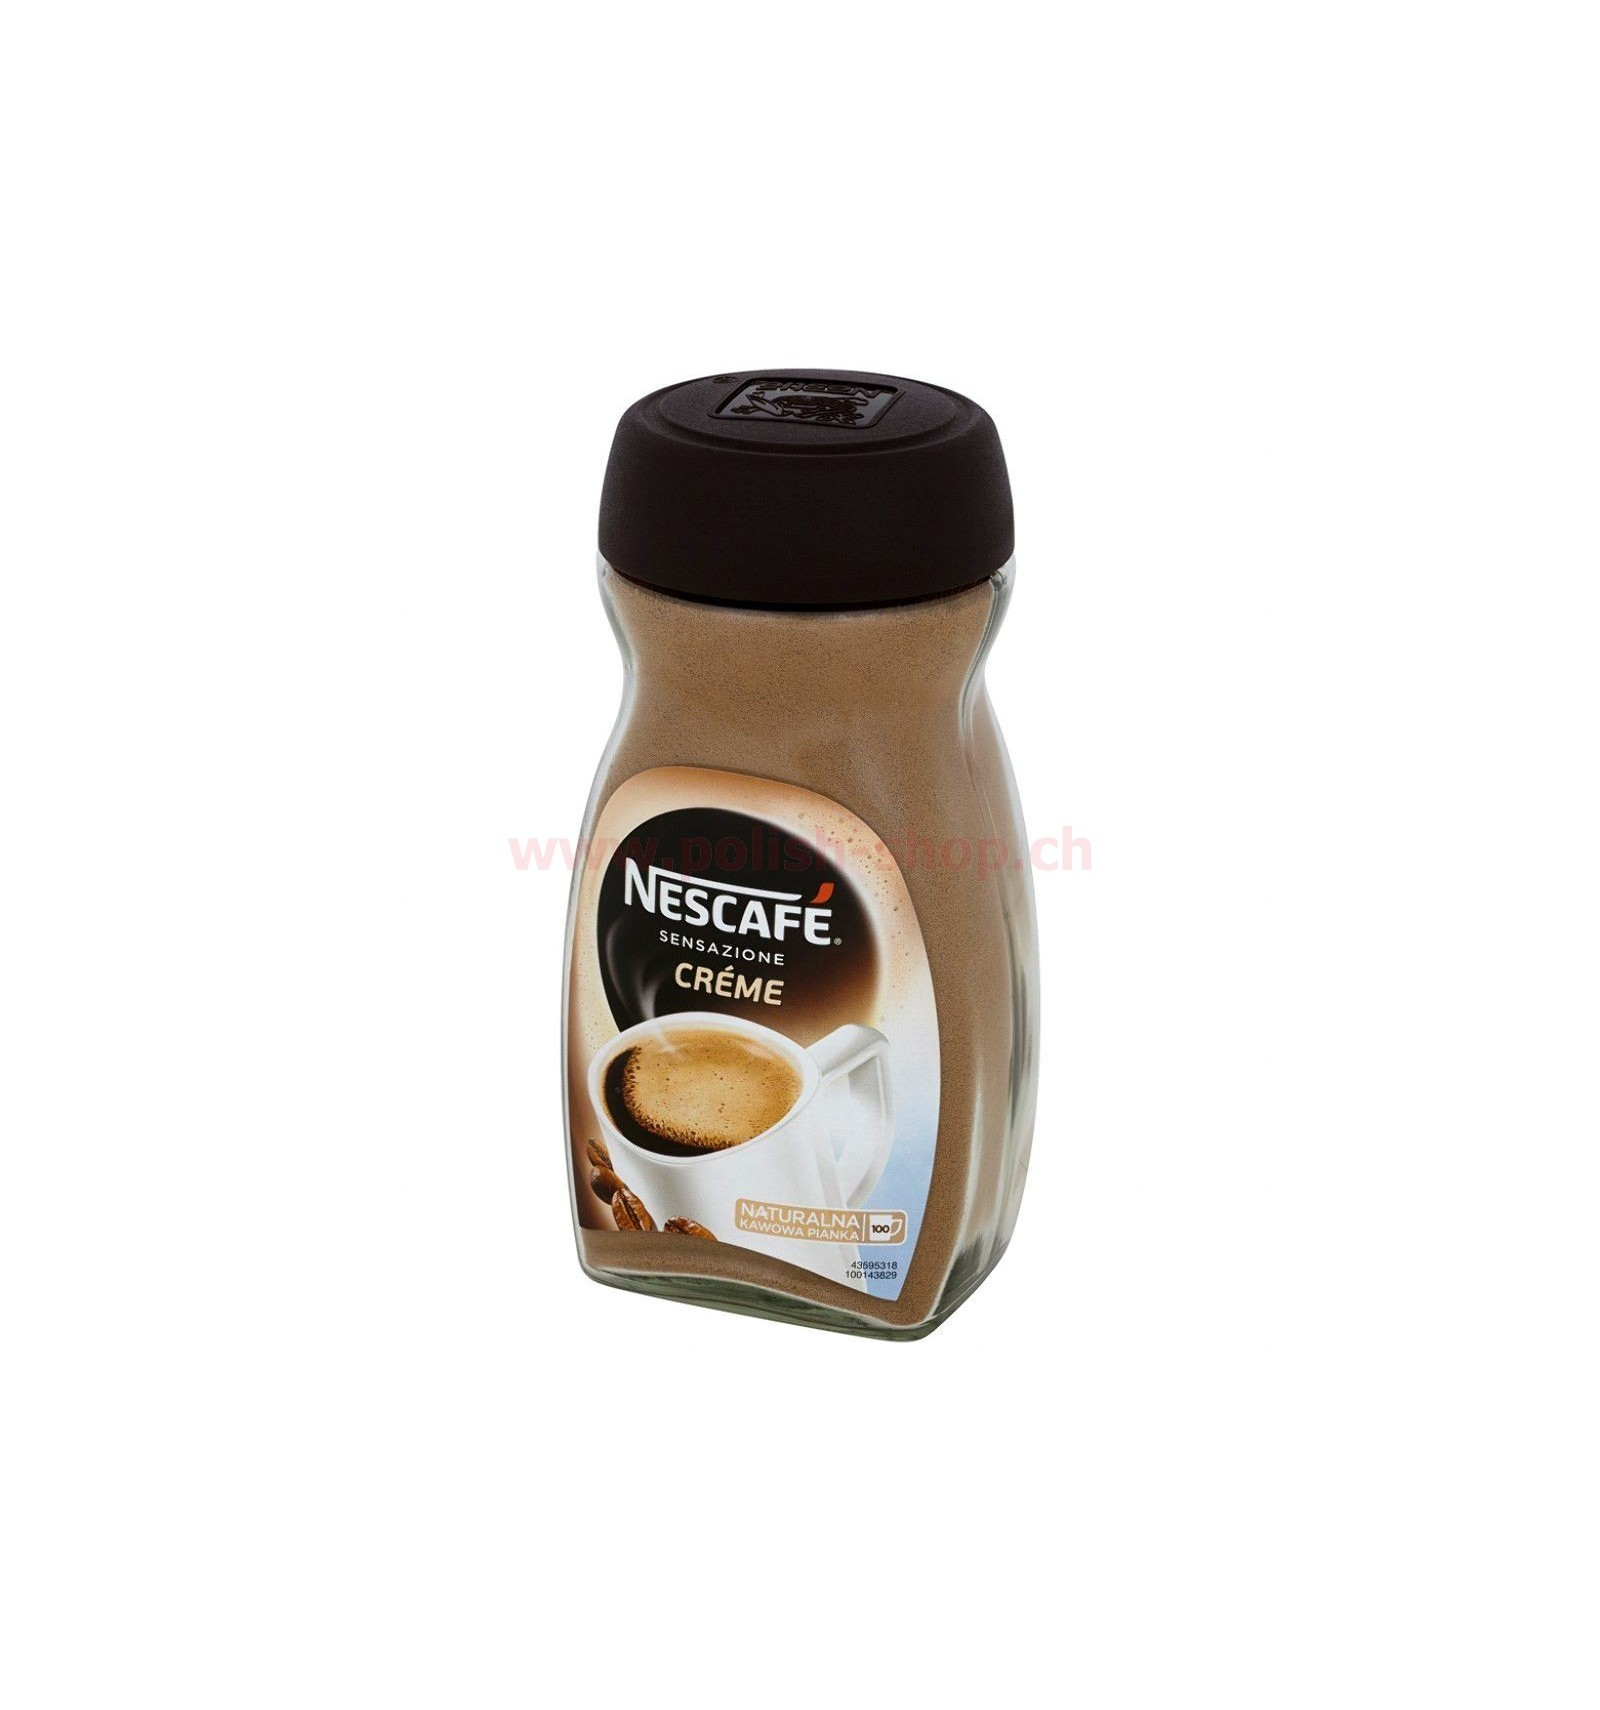 Kawa Nescafe Sensazione Creme 200g Polish Shop